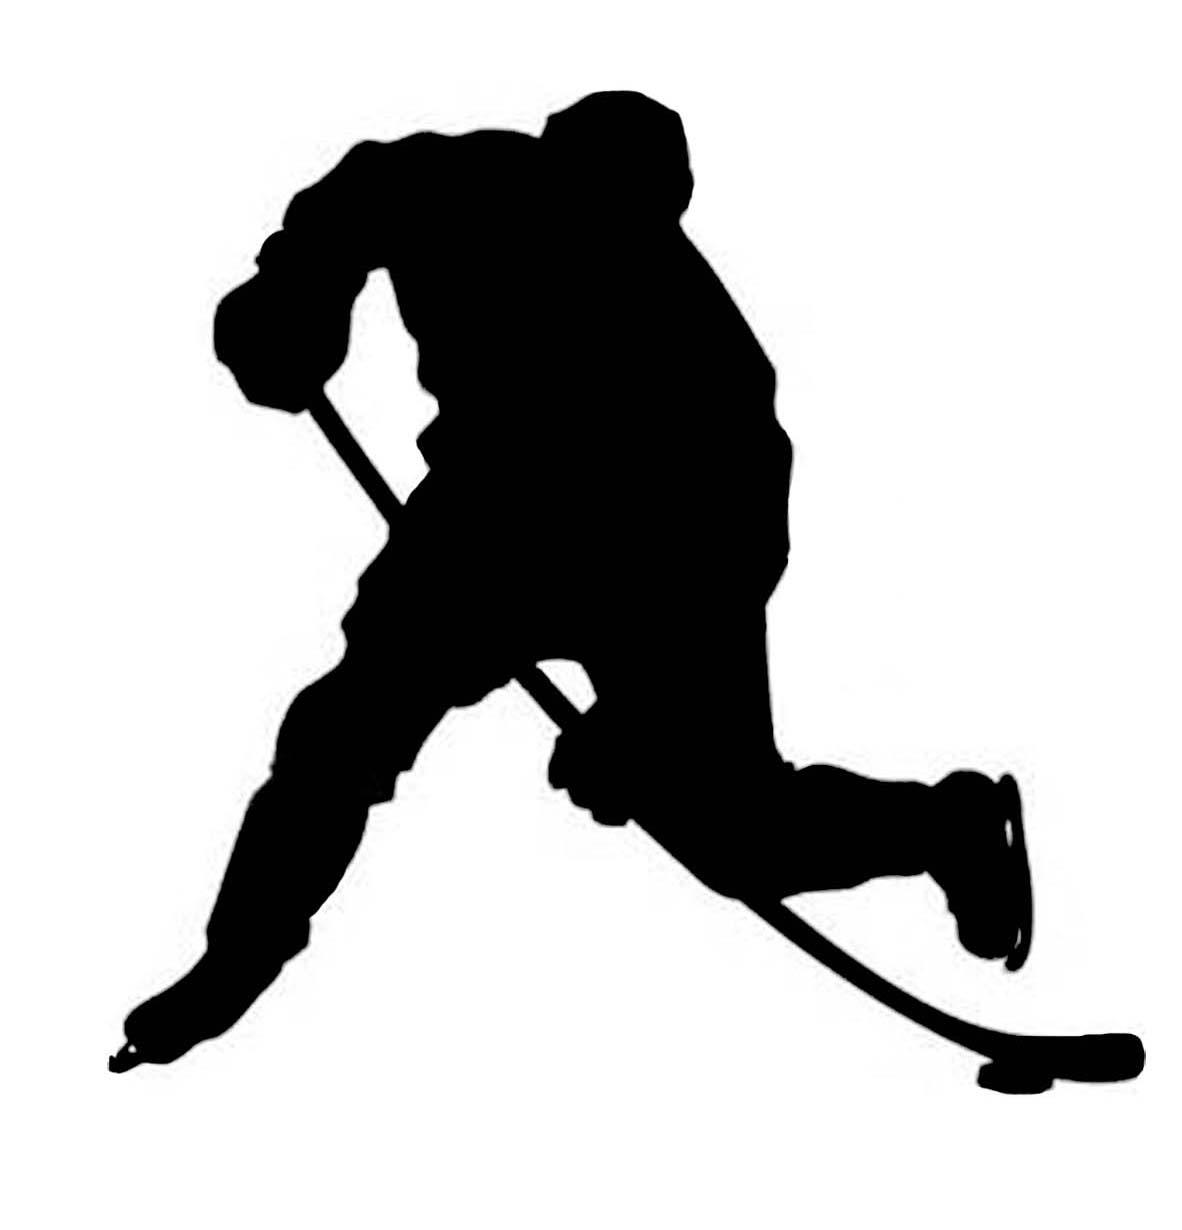 Shoot clipart hockey Coach Coach Reed Reed Fundamentals